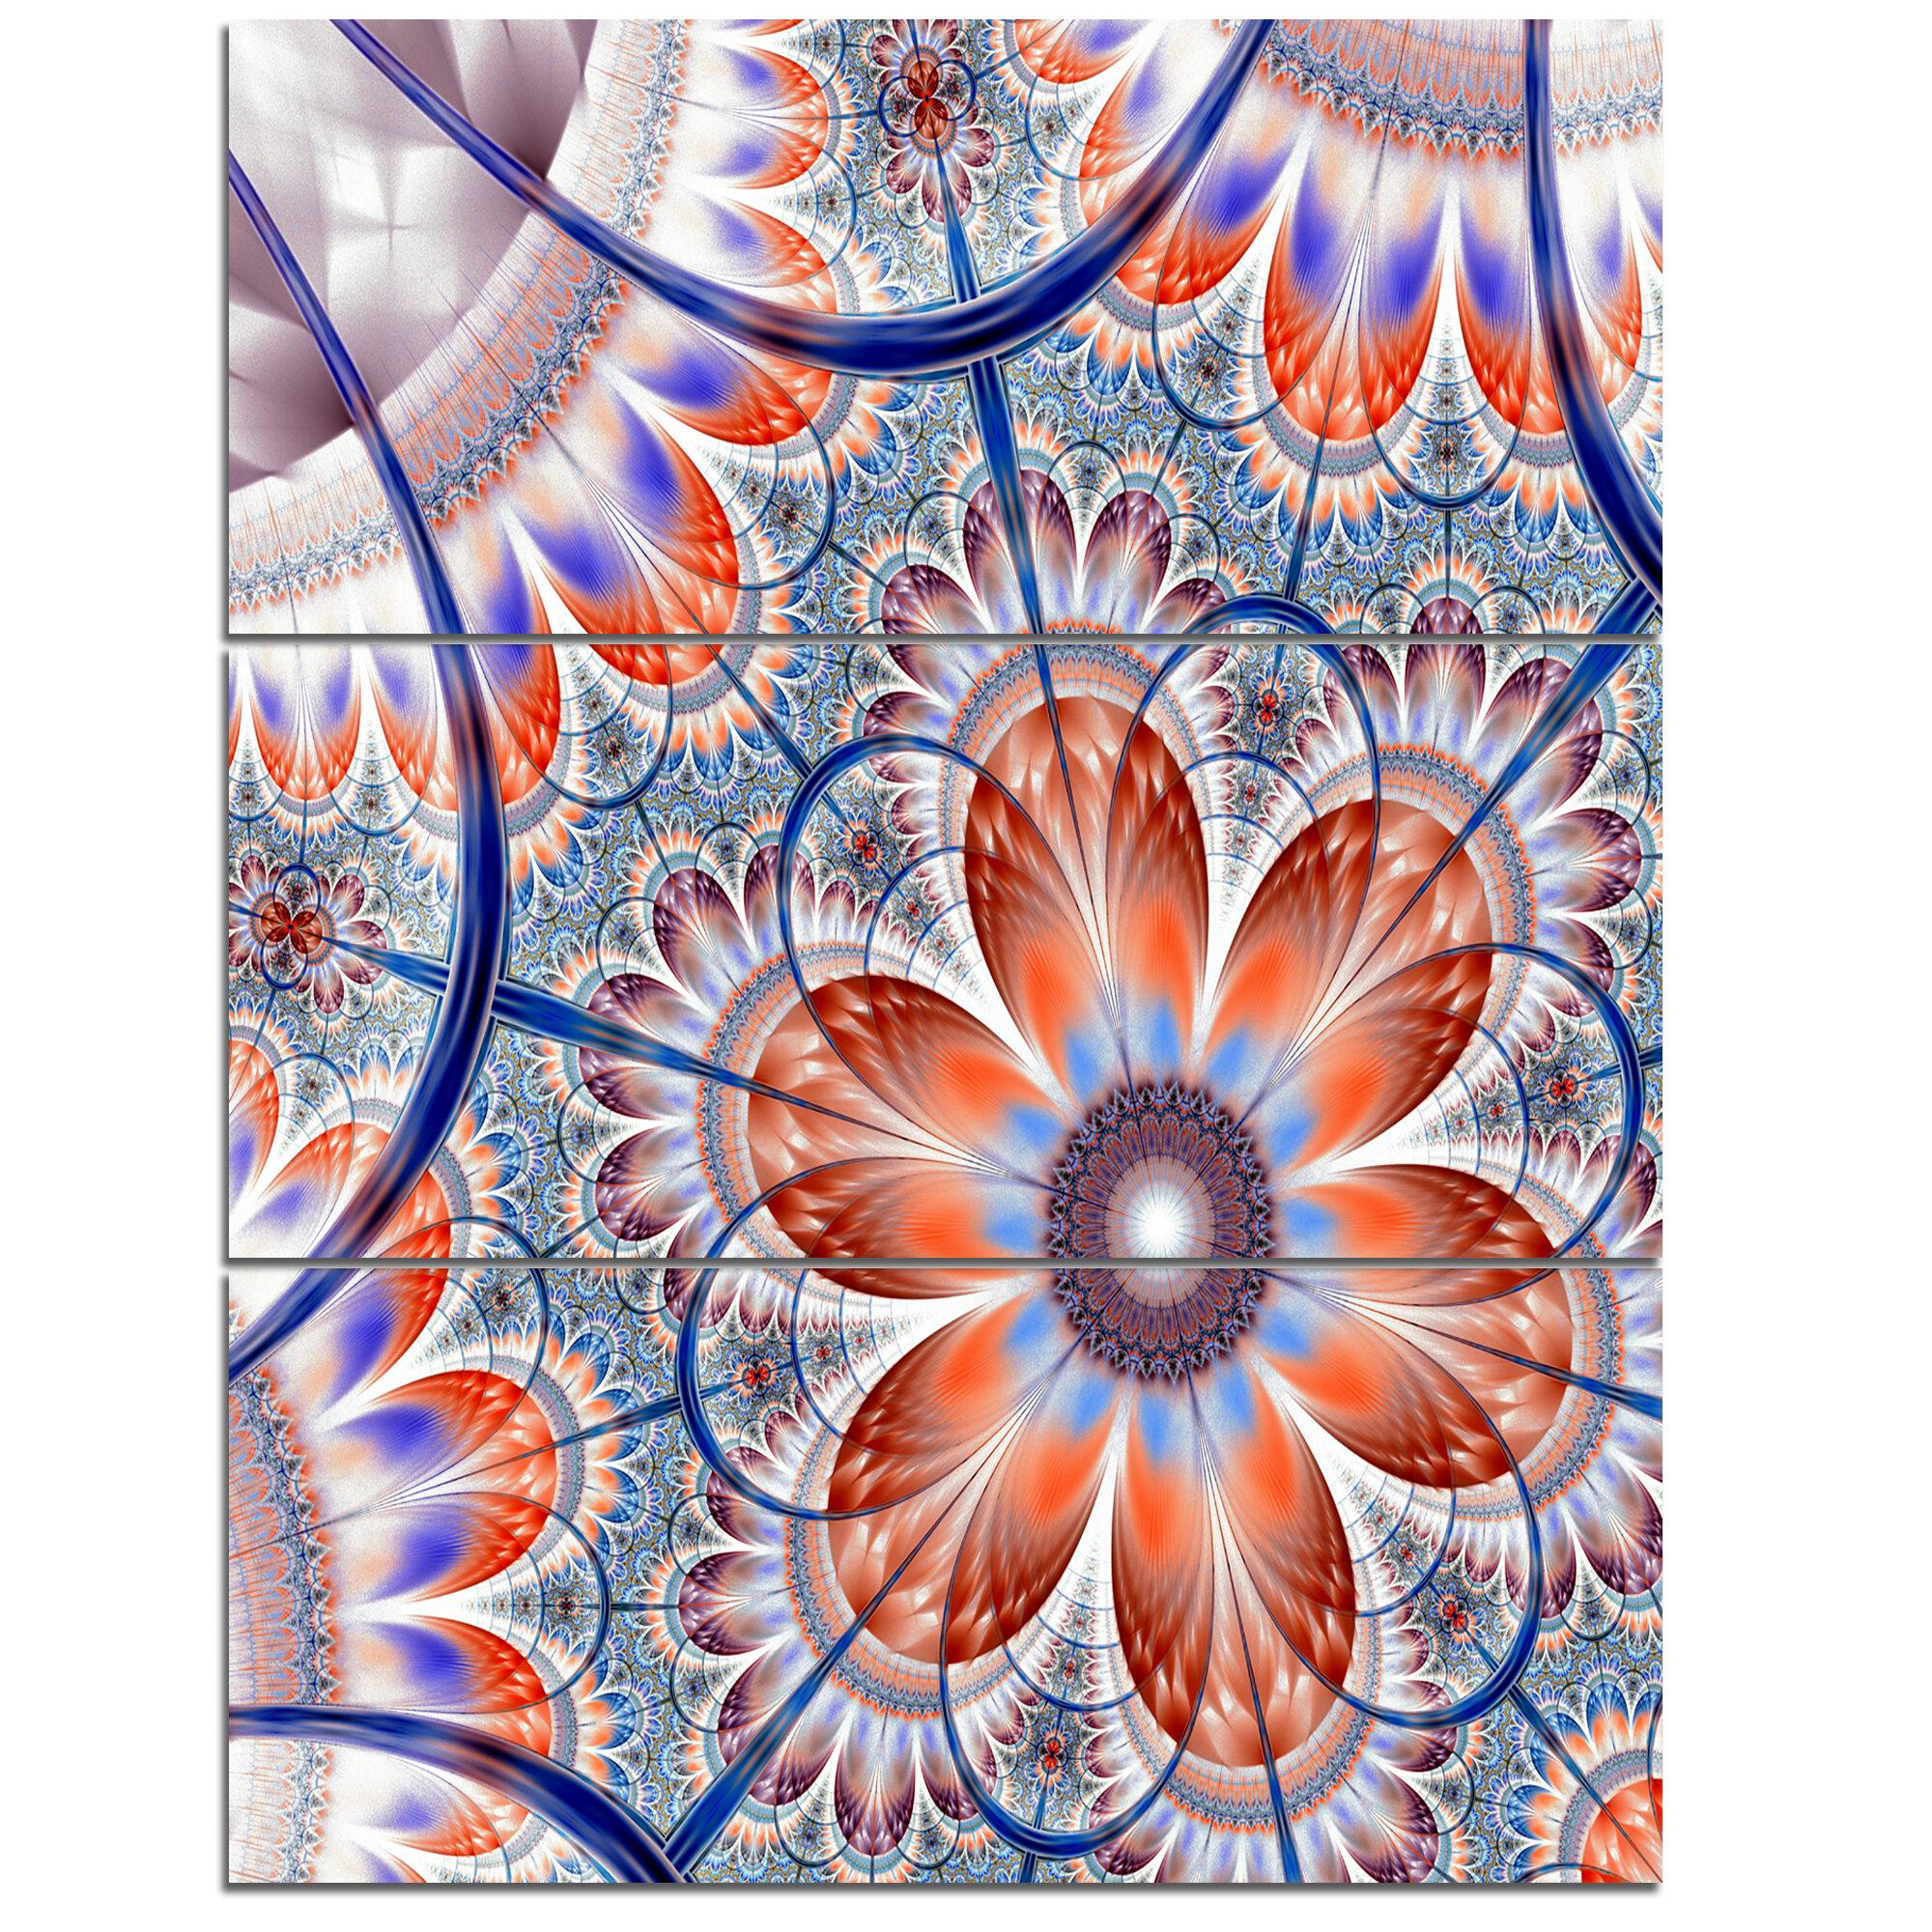 Designart Brown And Blue Large Fractal Flower 3 Piece Graphic Art On Wrapped Canvas Set Wayfair